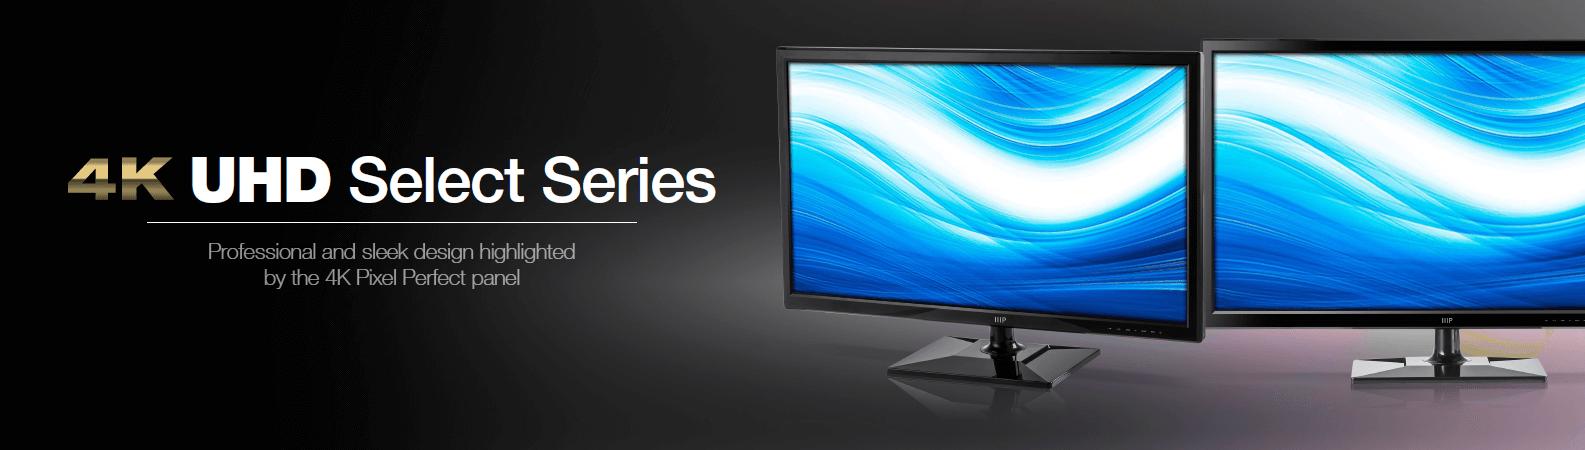 28-inch 4K UHD PixelPerfect Monitor